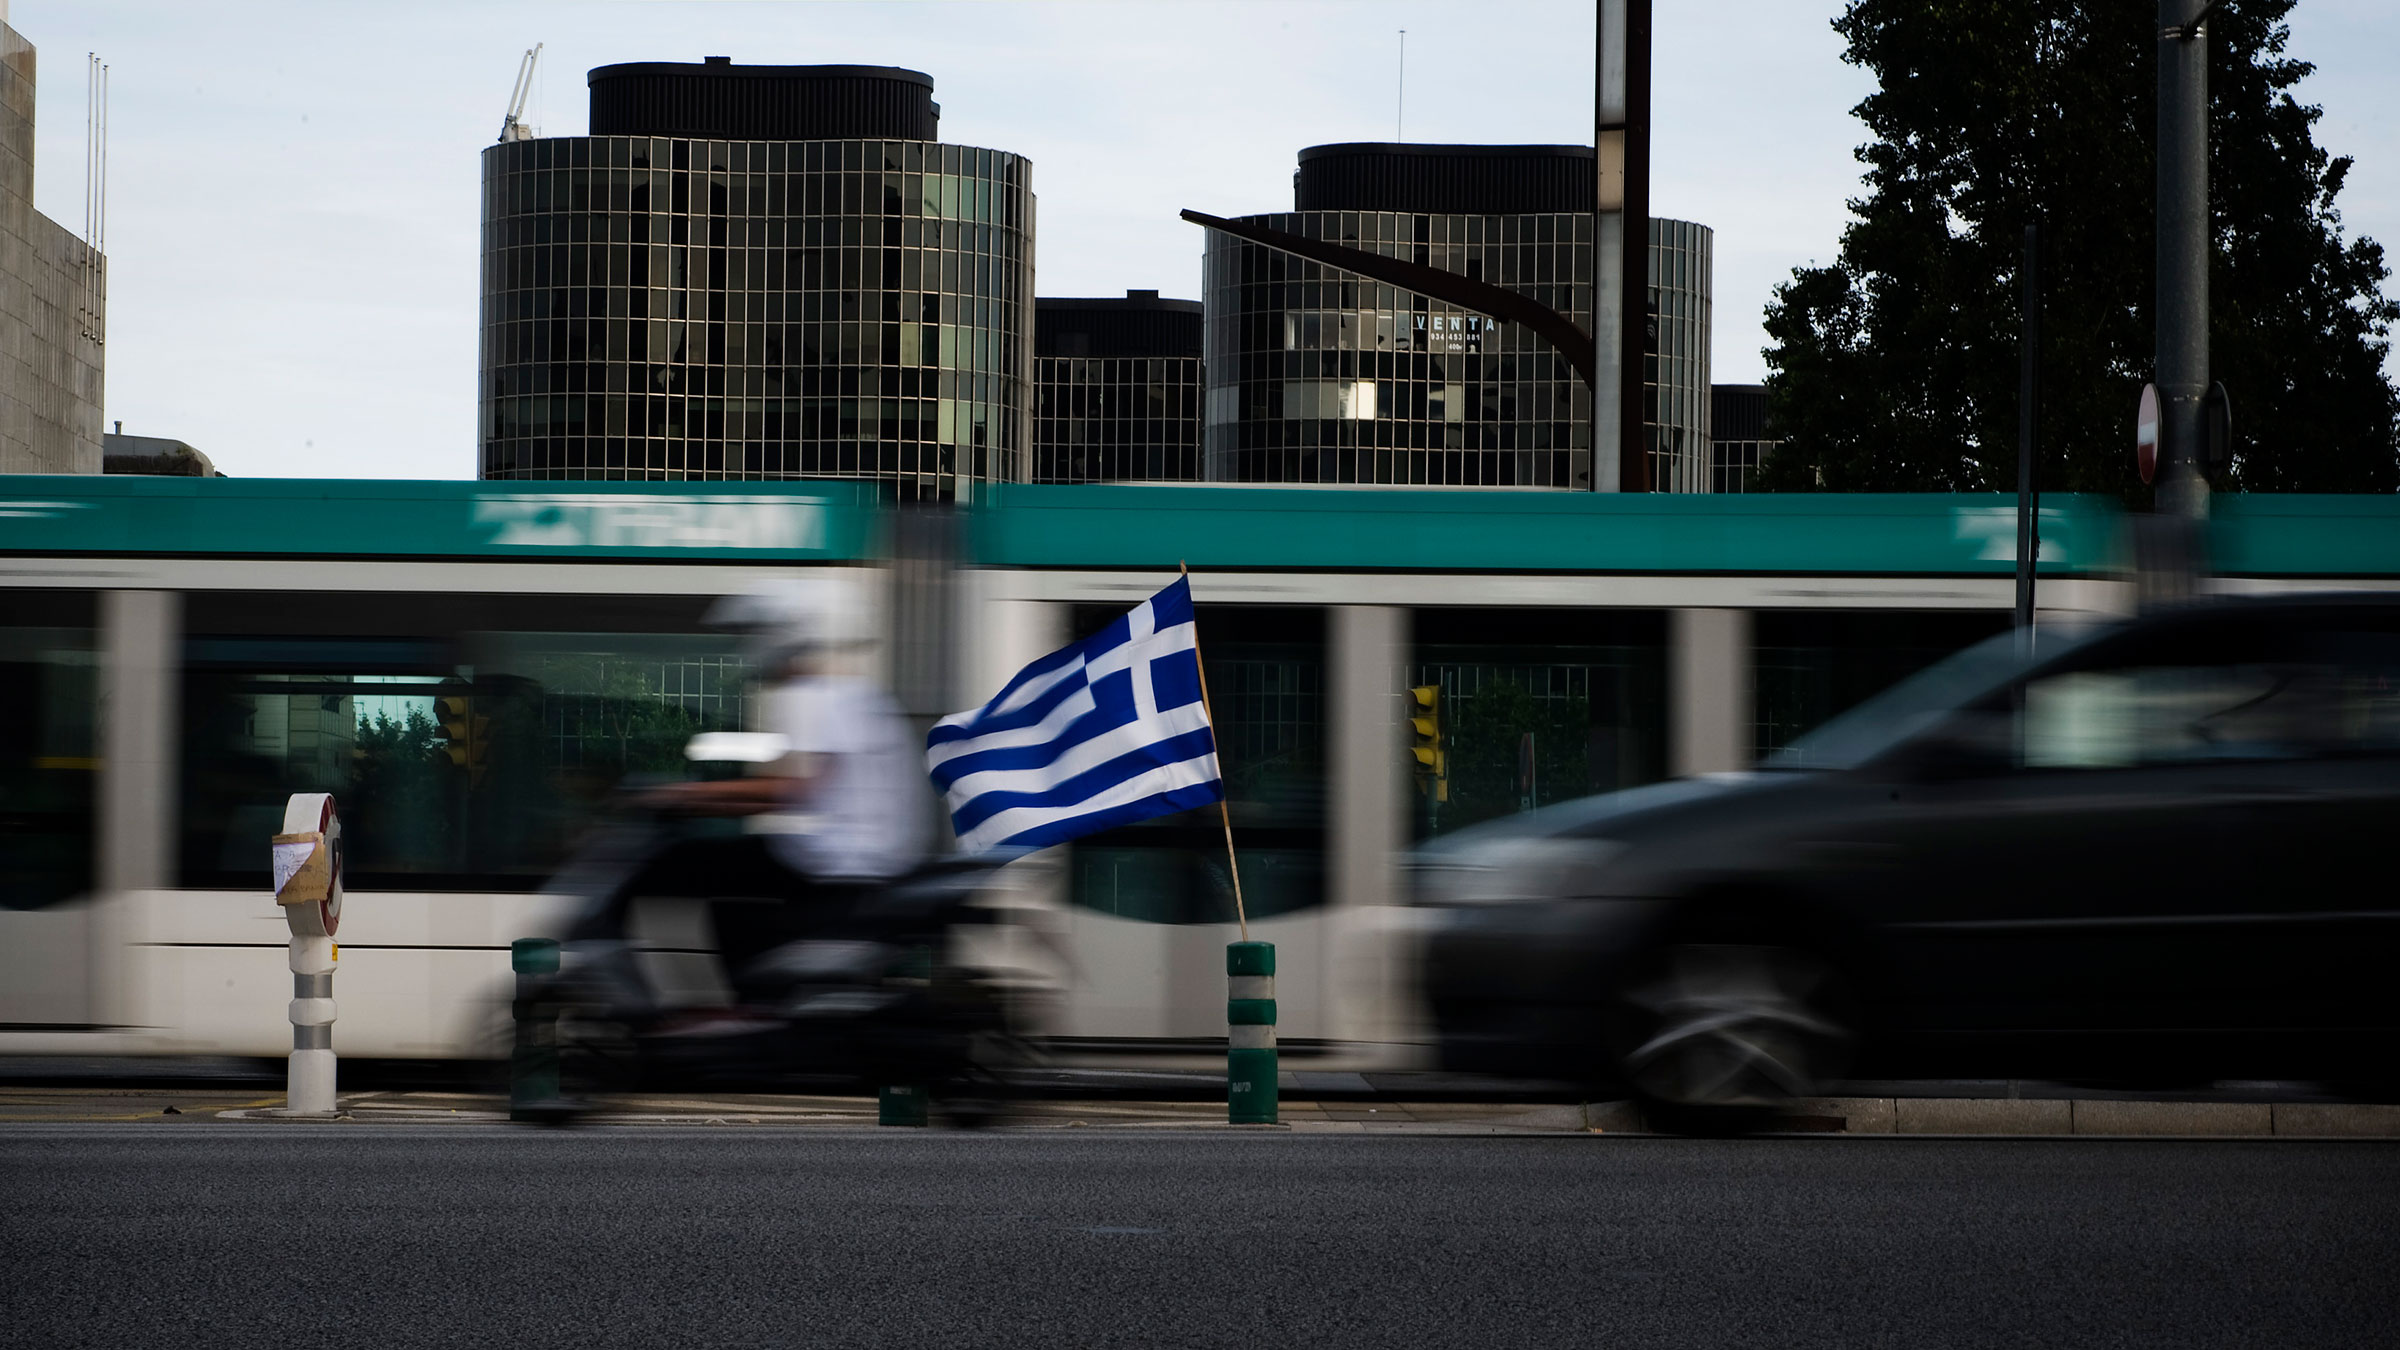 greek-flag-spain-9172012-web